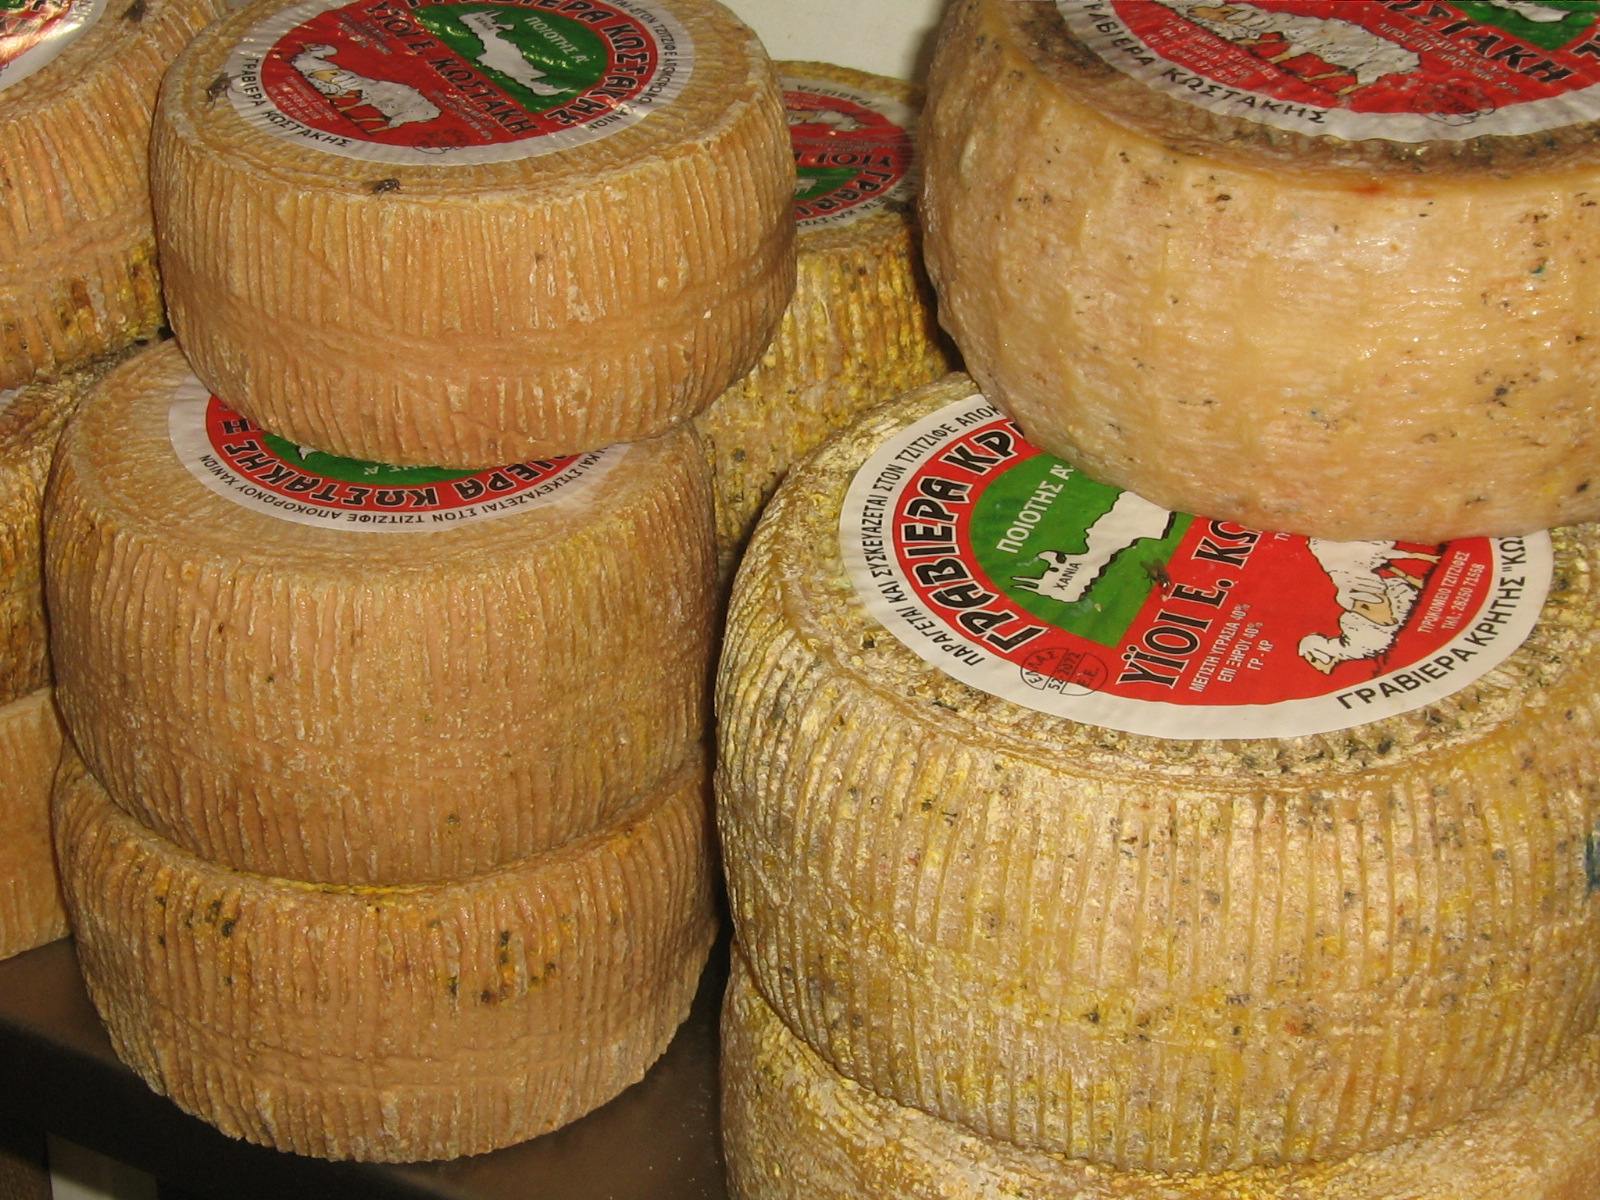 Graviera, smakrik ost från Kreta